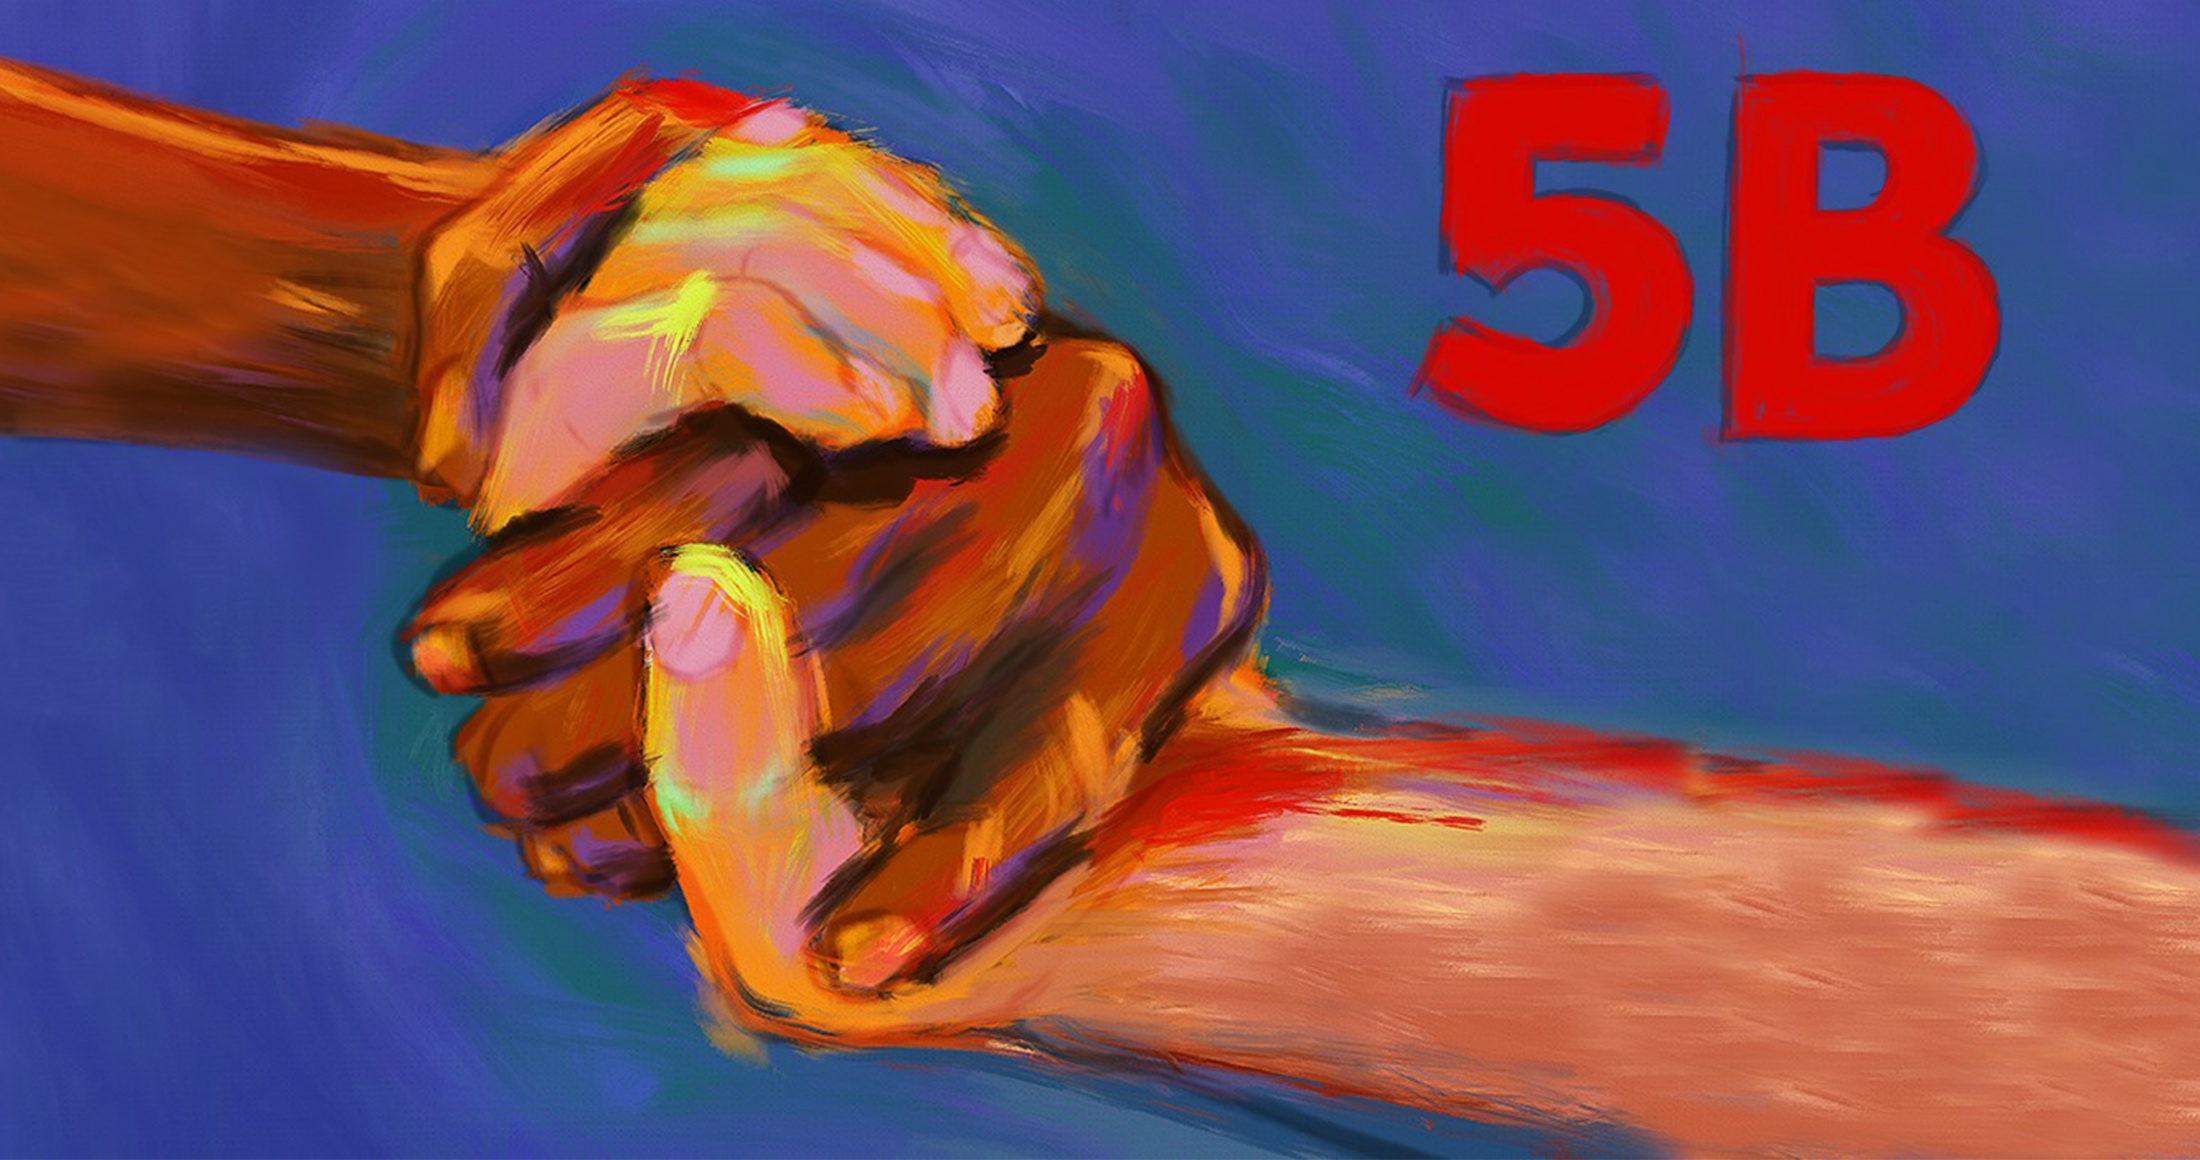 5B Film Thumbnail